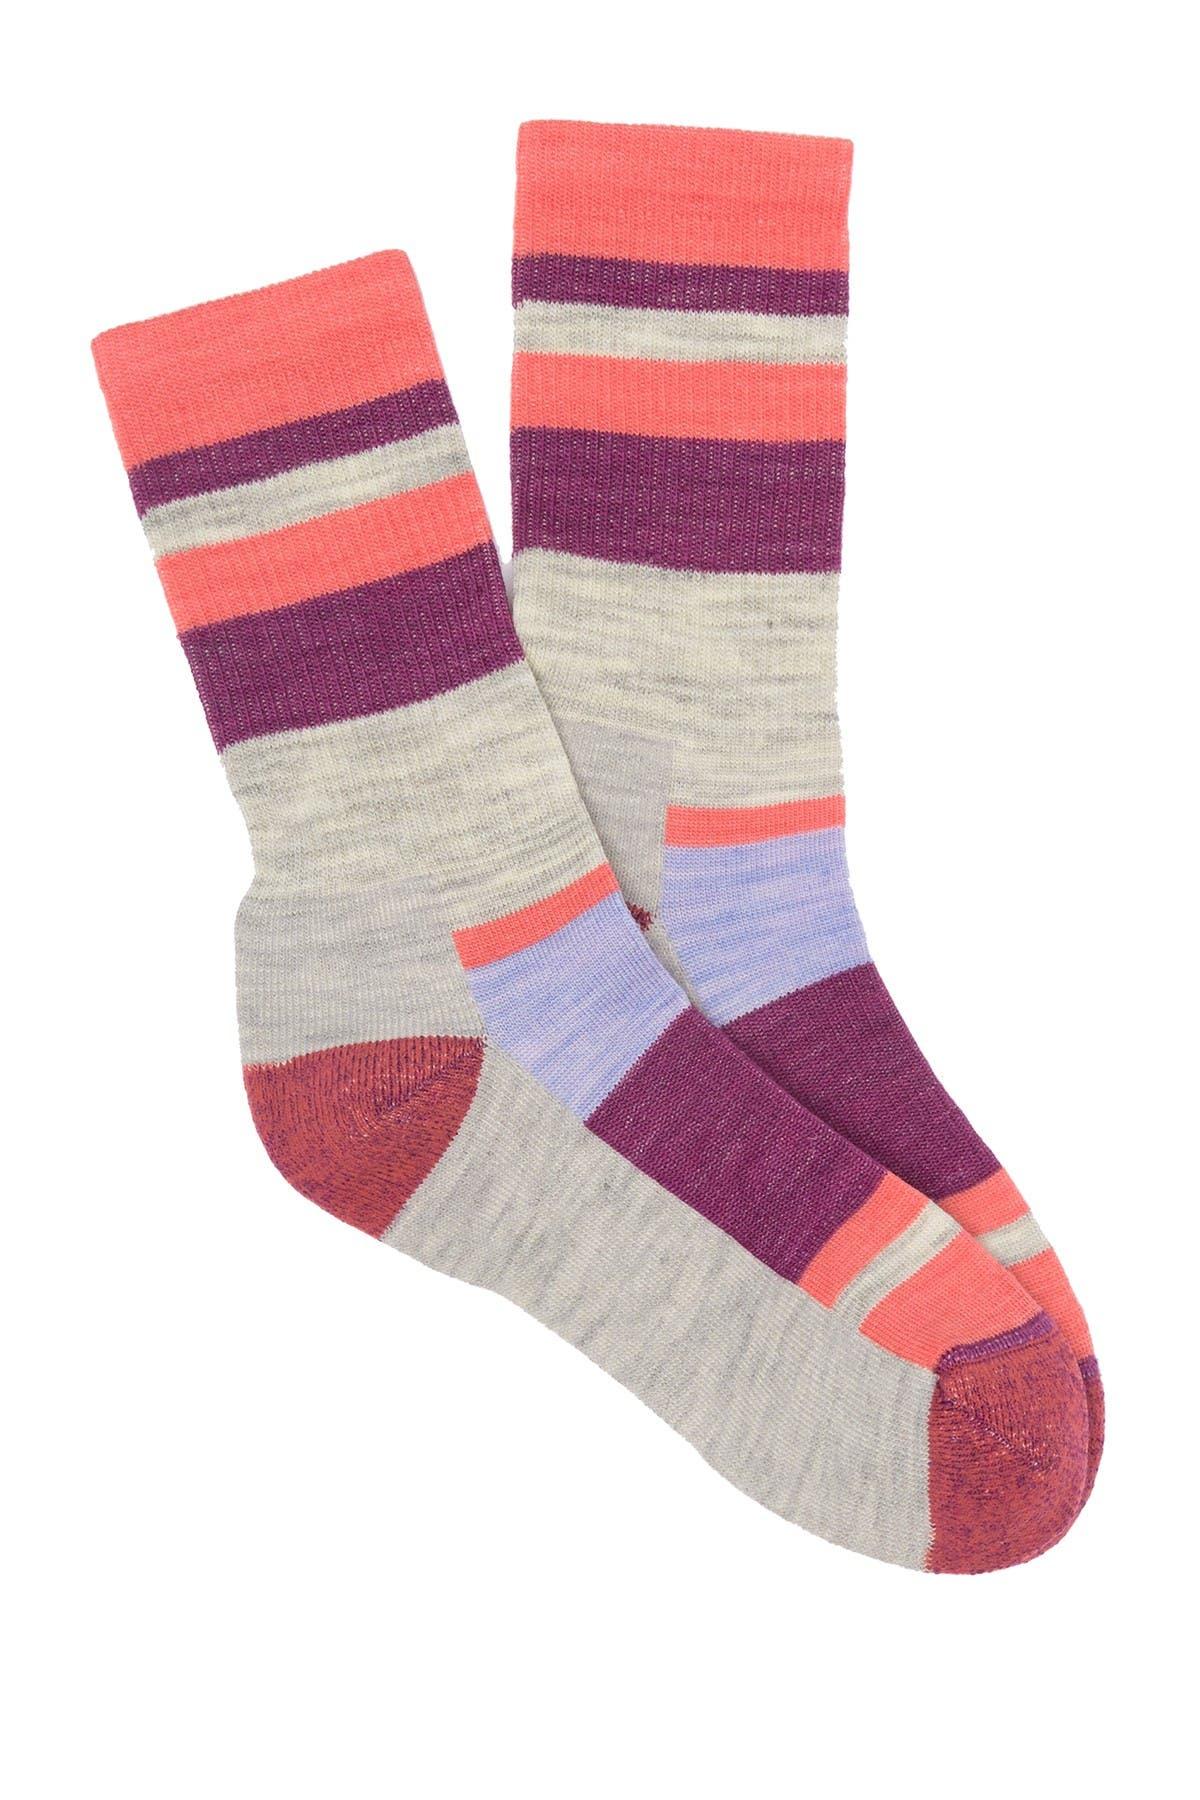 Image of SmartWool Hike Light Striped Crew Socks